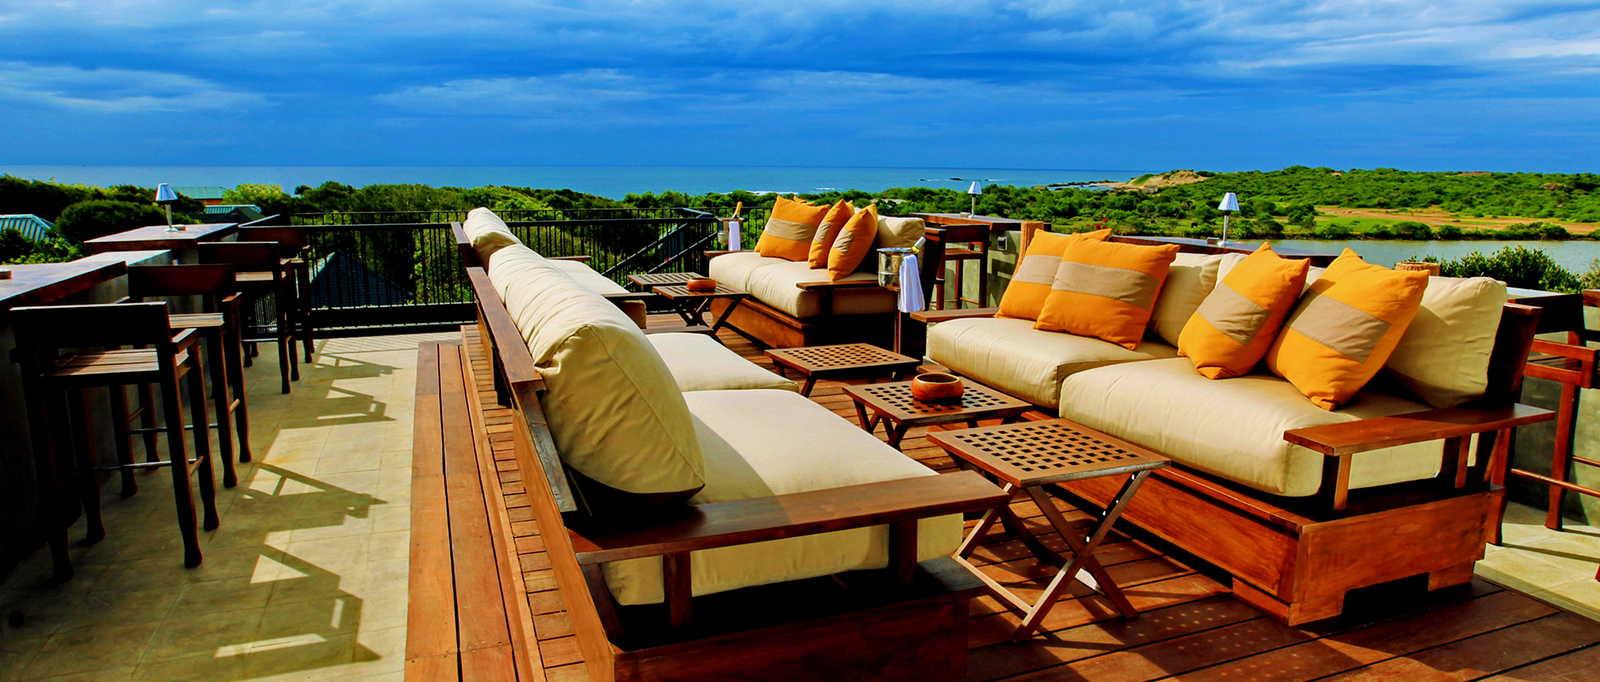 Cinnamon Wild Hotel, Yala, Sri Lanka